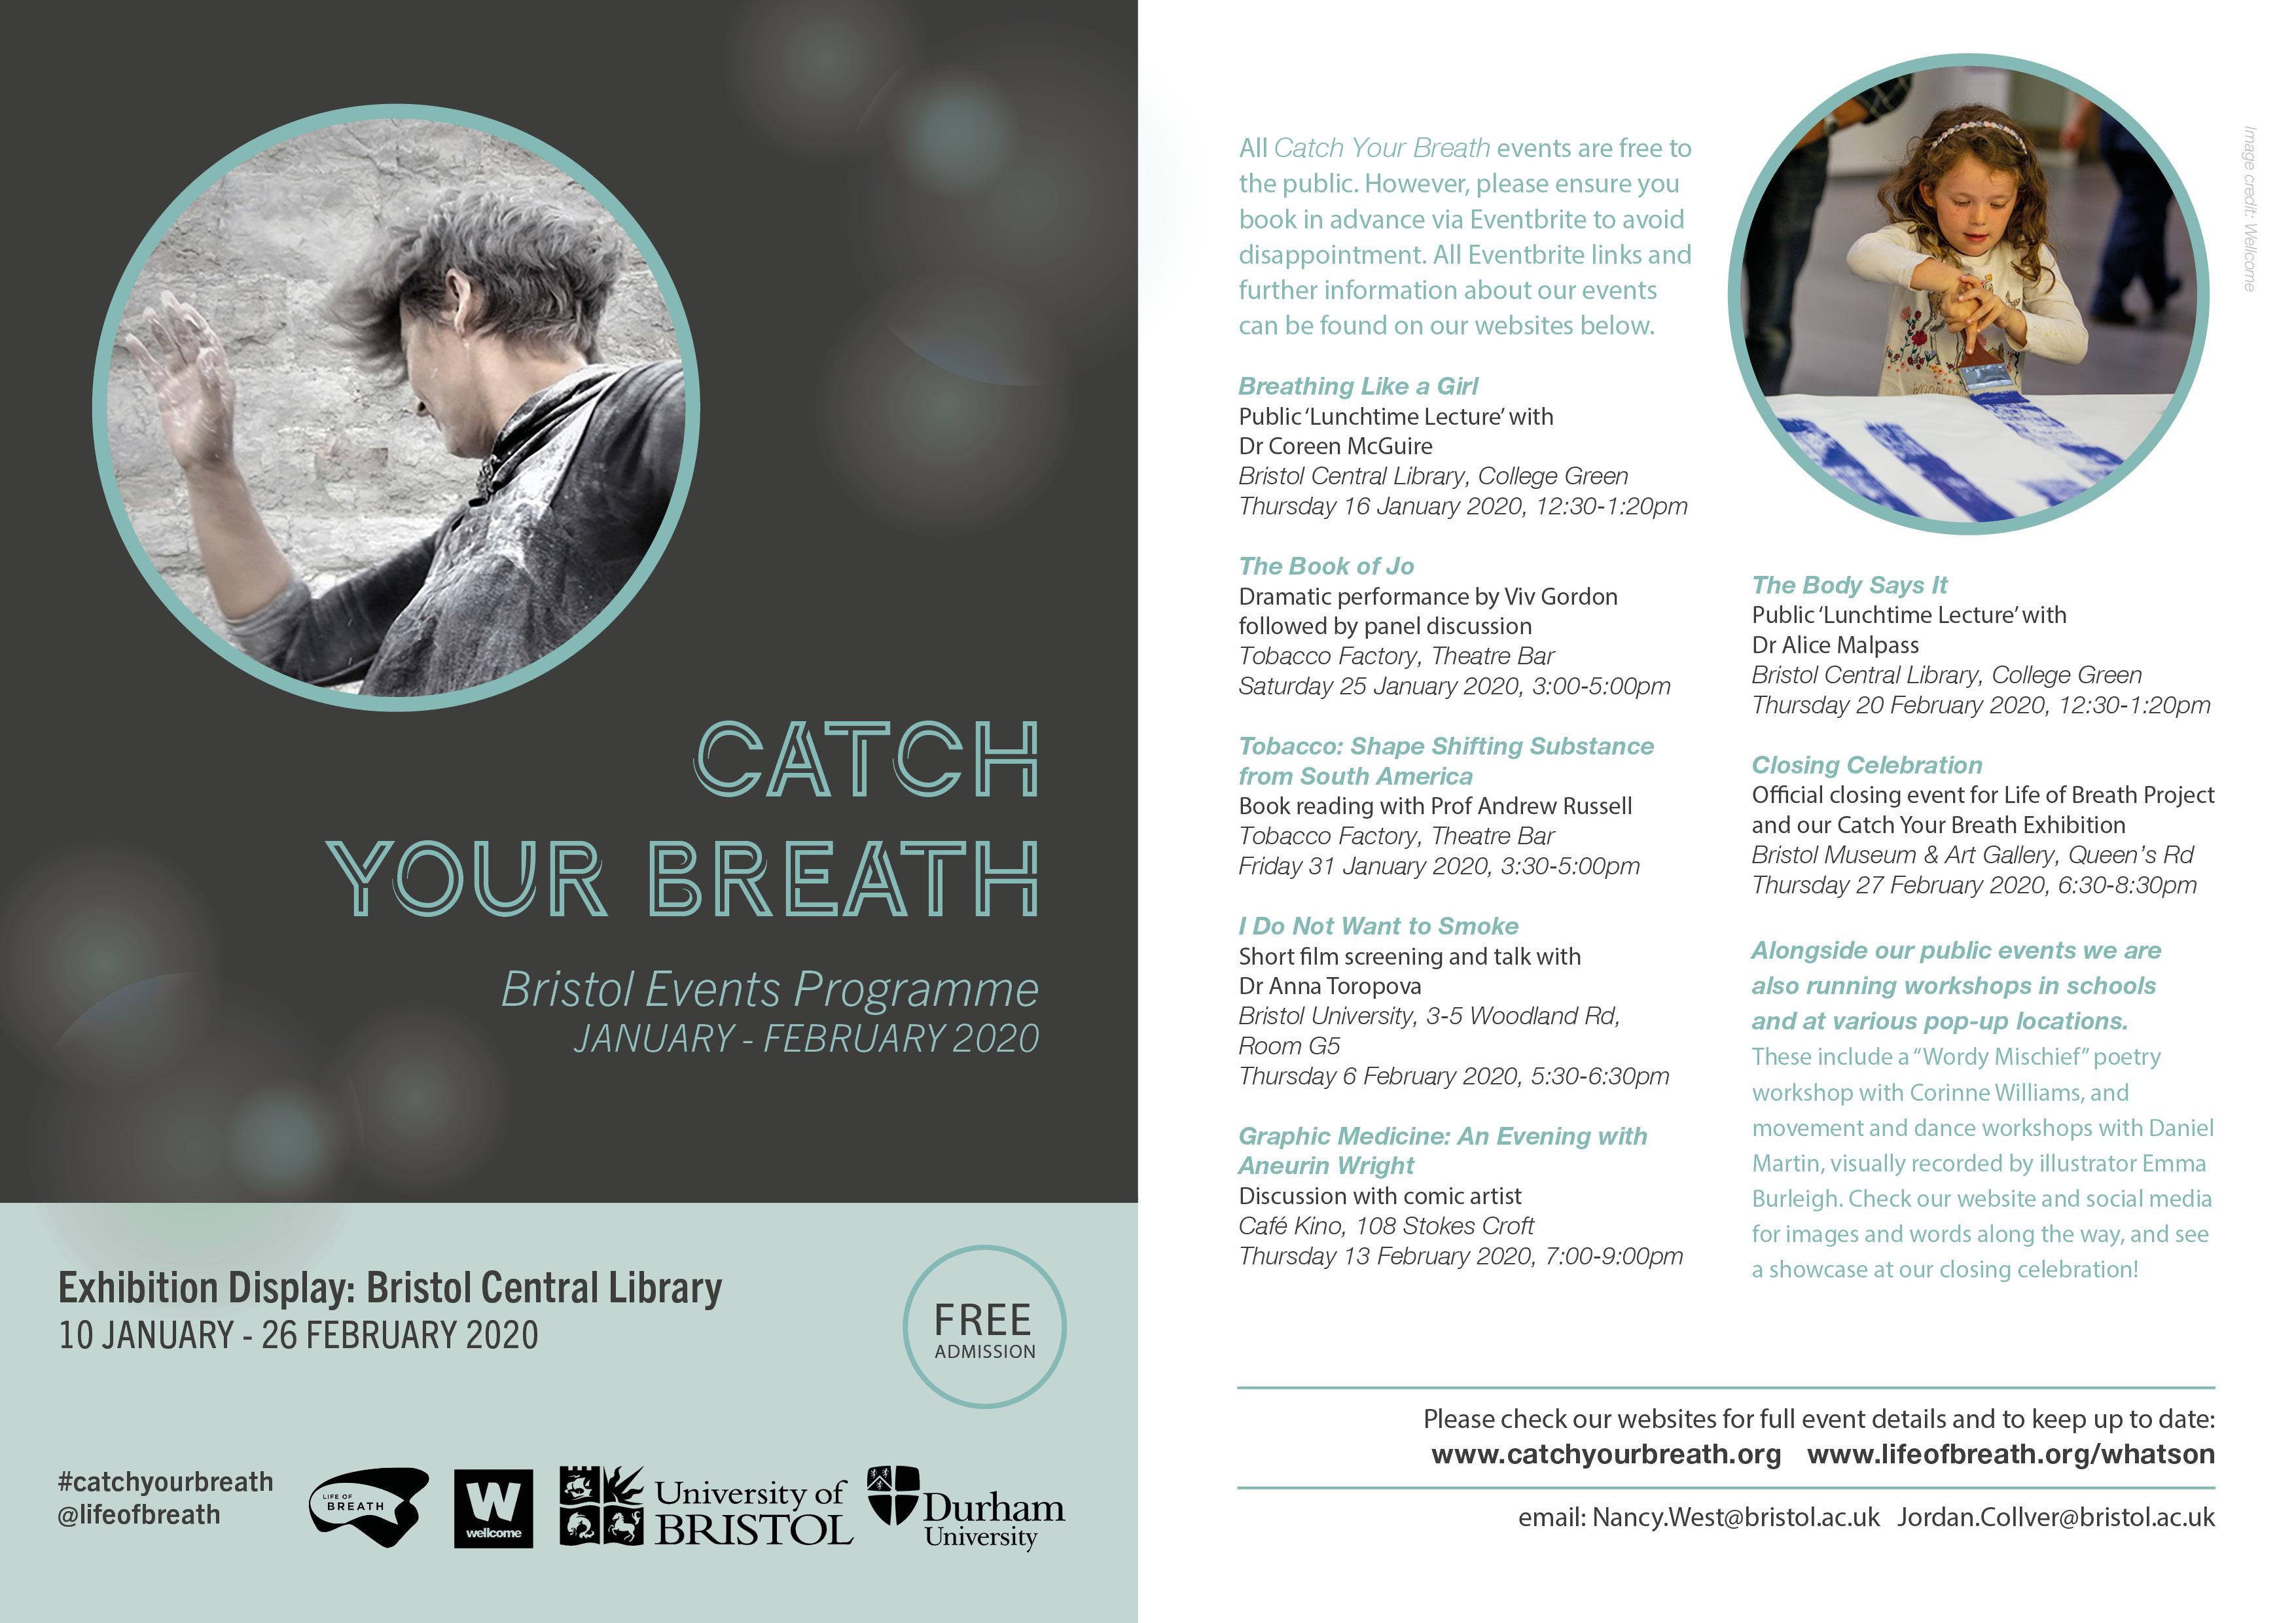 CyB A5 Events Leaflet (Bristol 2020).jpg